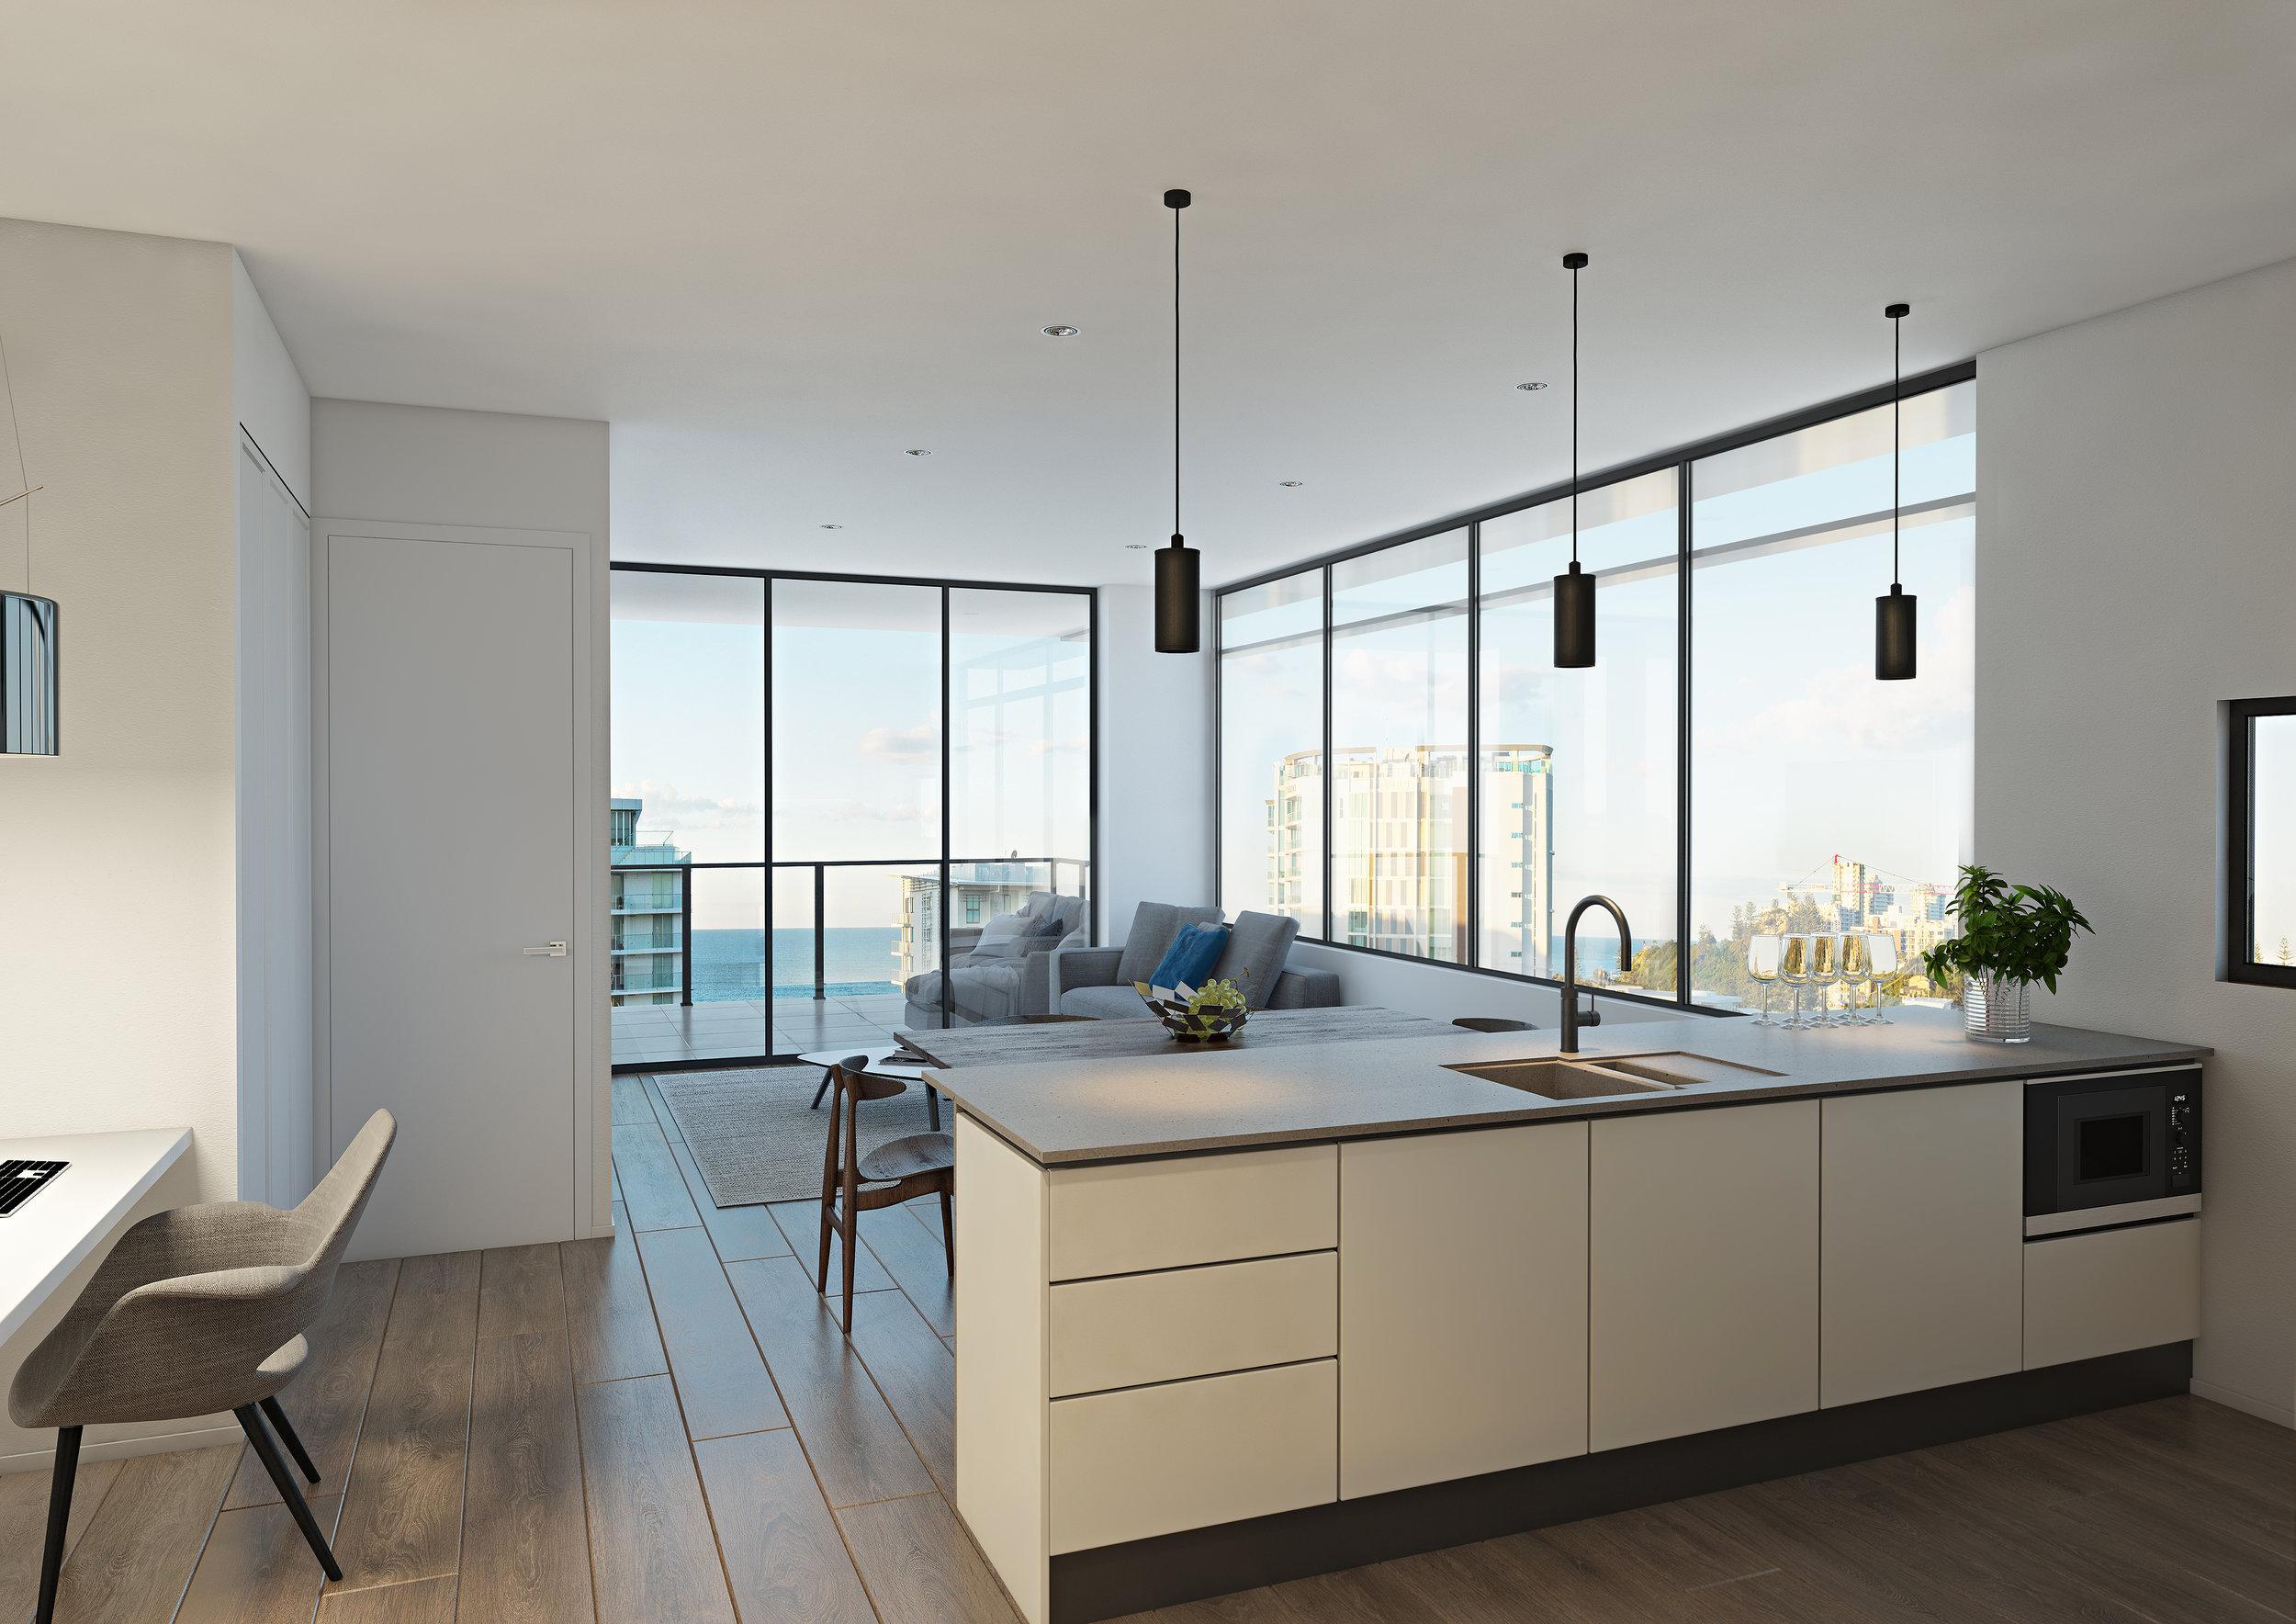 Zinc_ Kitchen_LivingView1.jpg